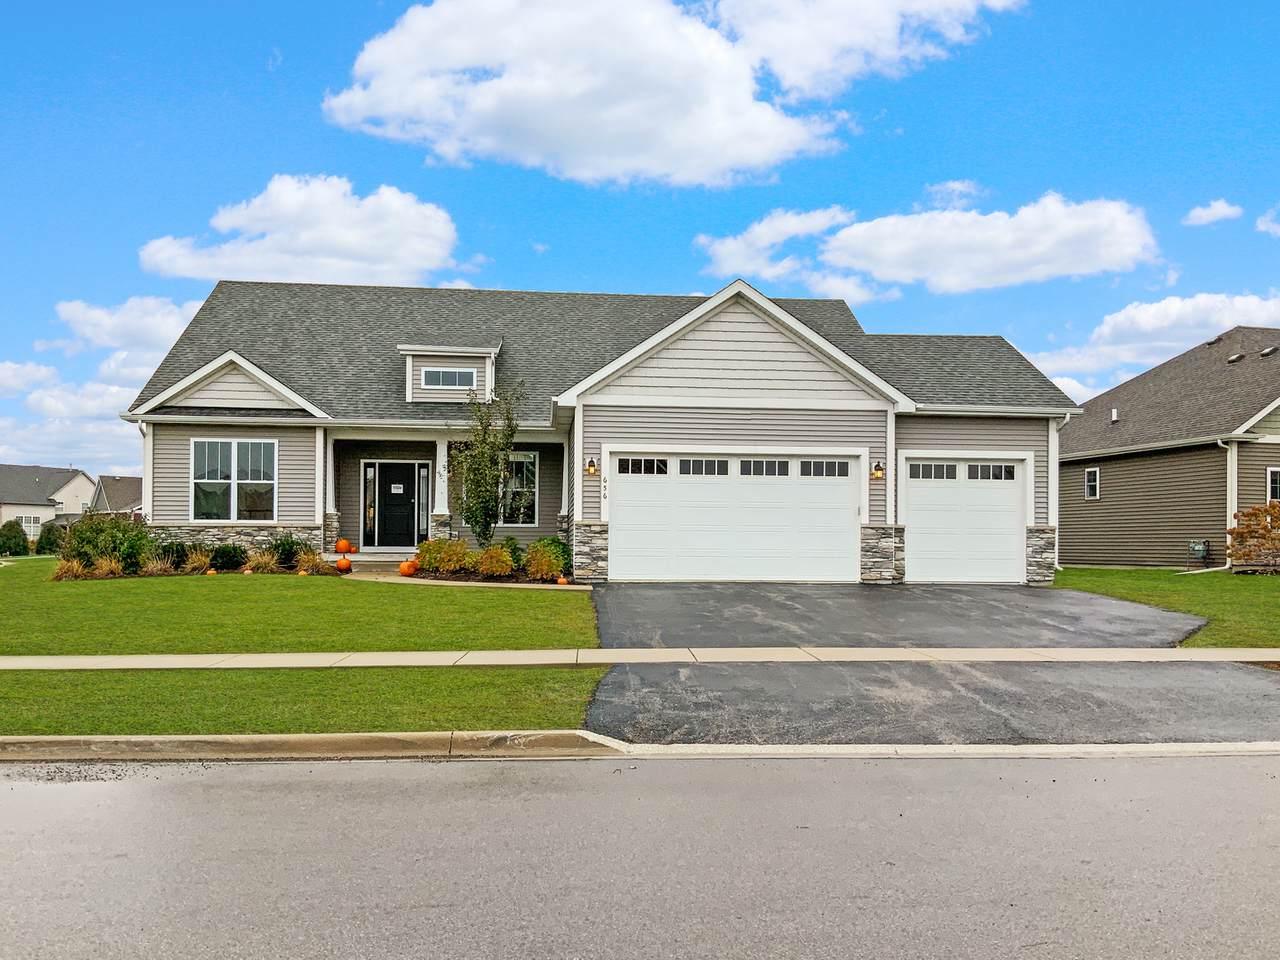 10463 Deer Creek Lane - Photo 1